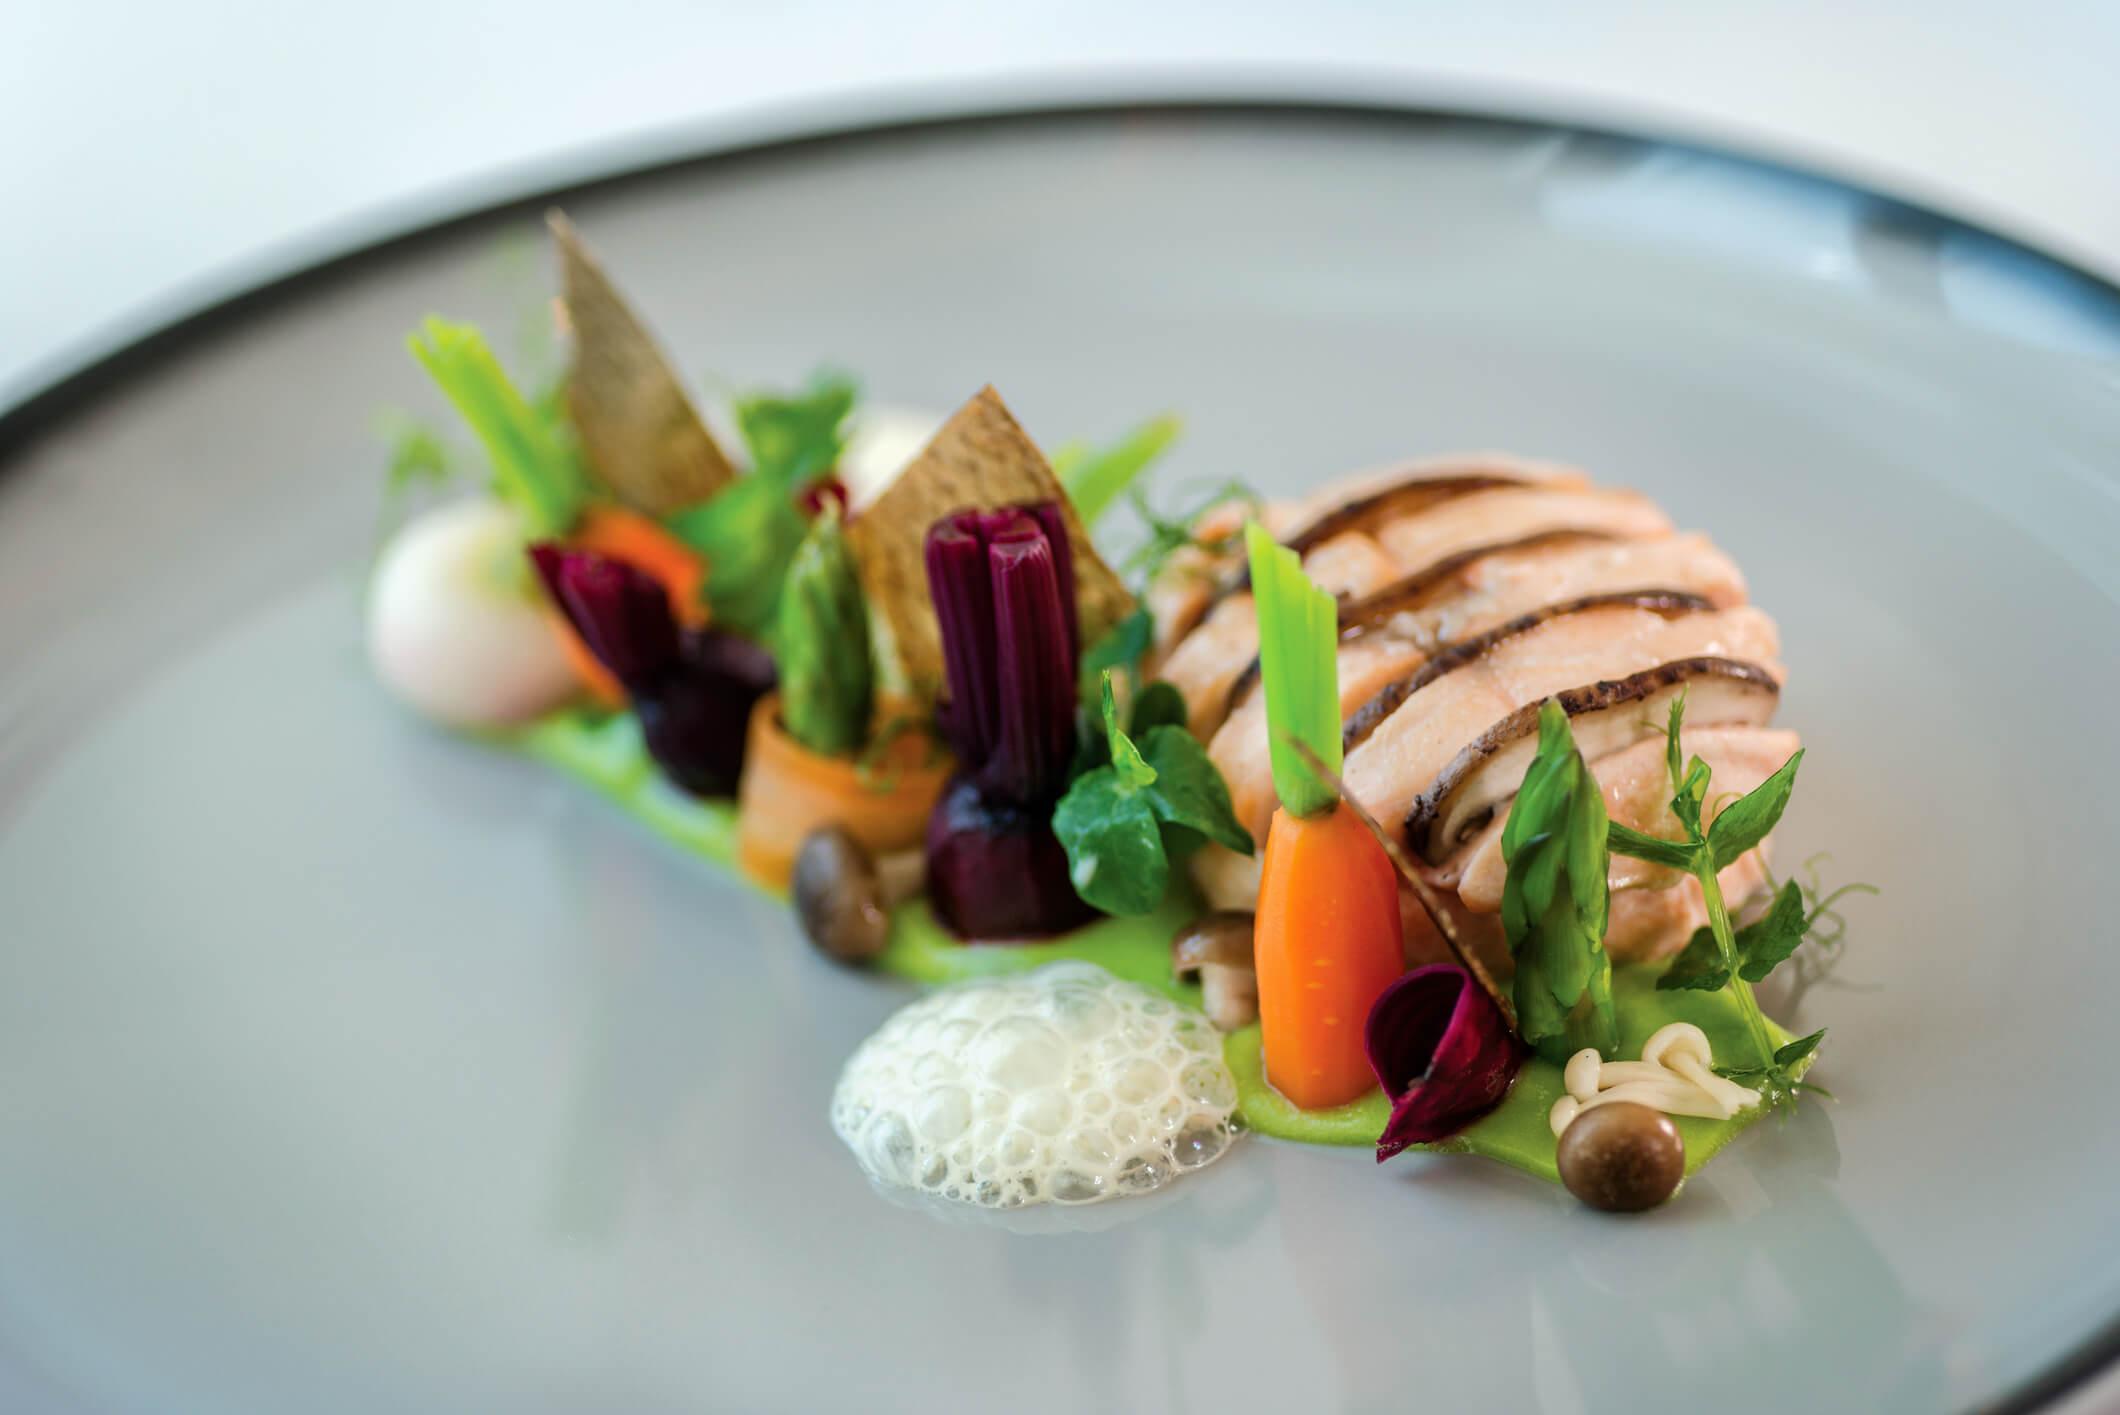 Restaurantes con Estrella Michelin a precio de risa